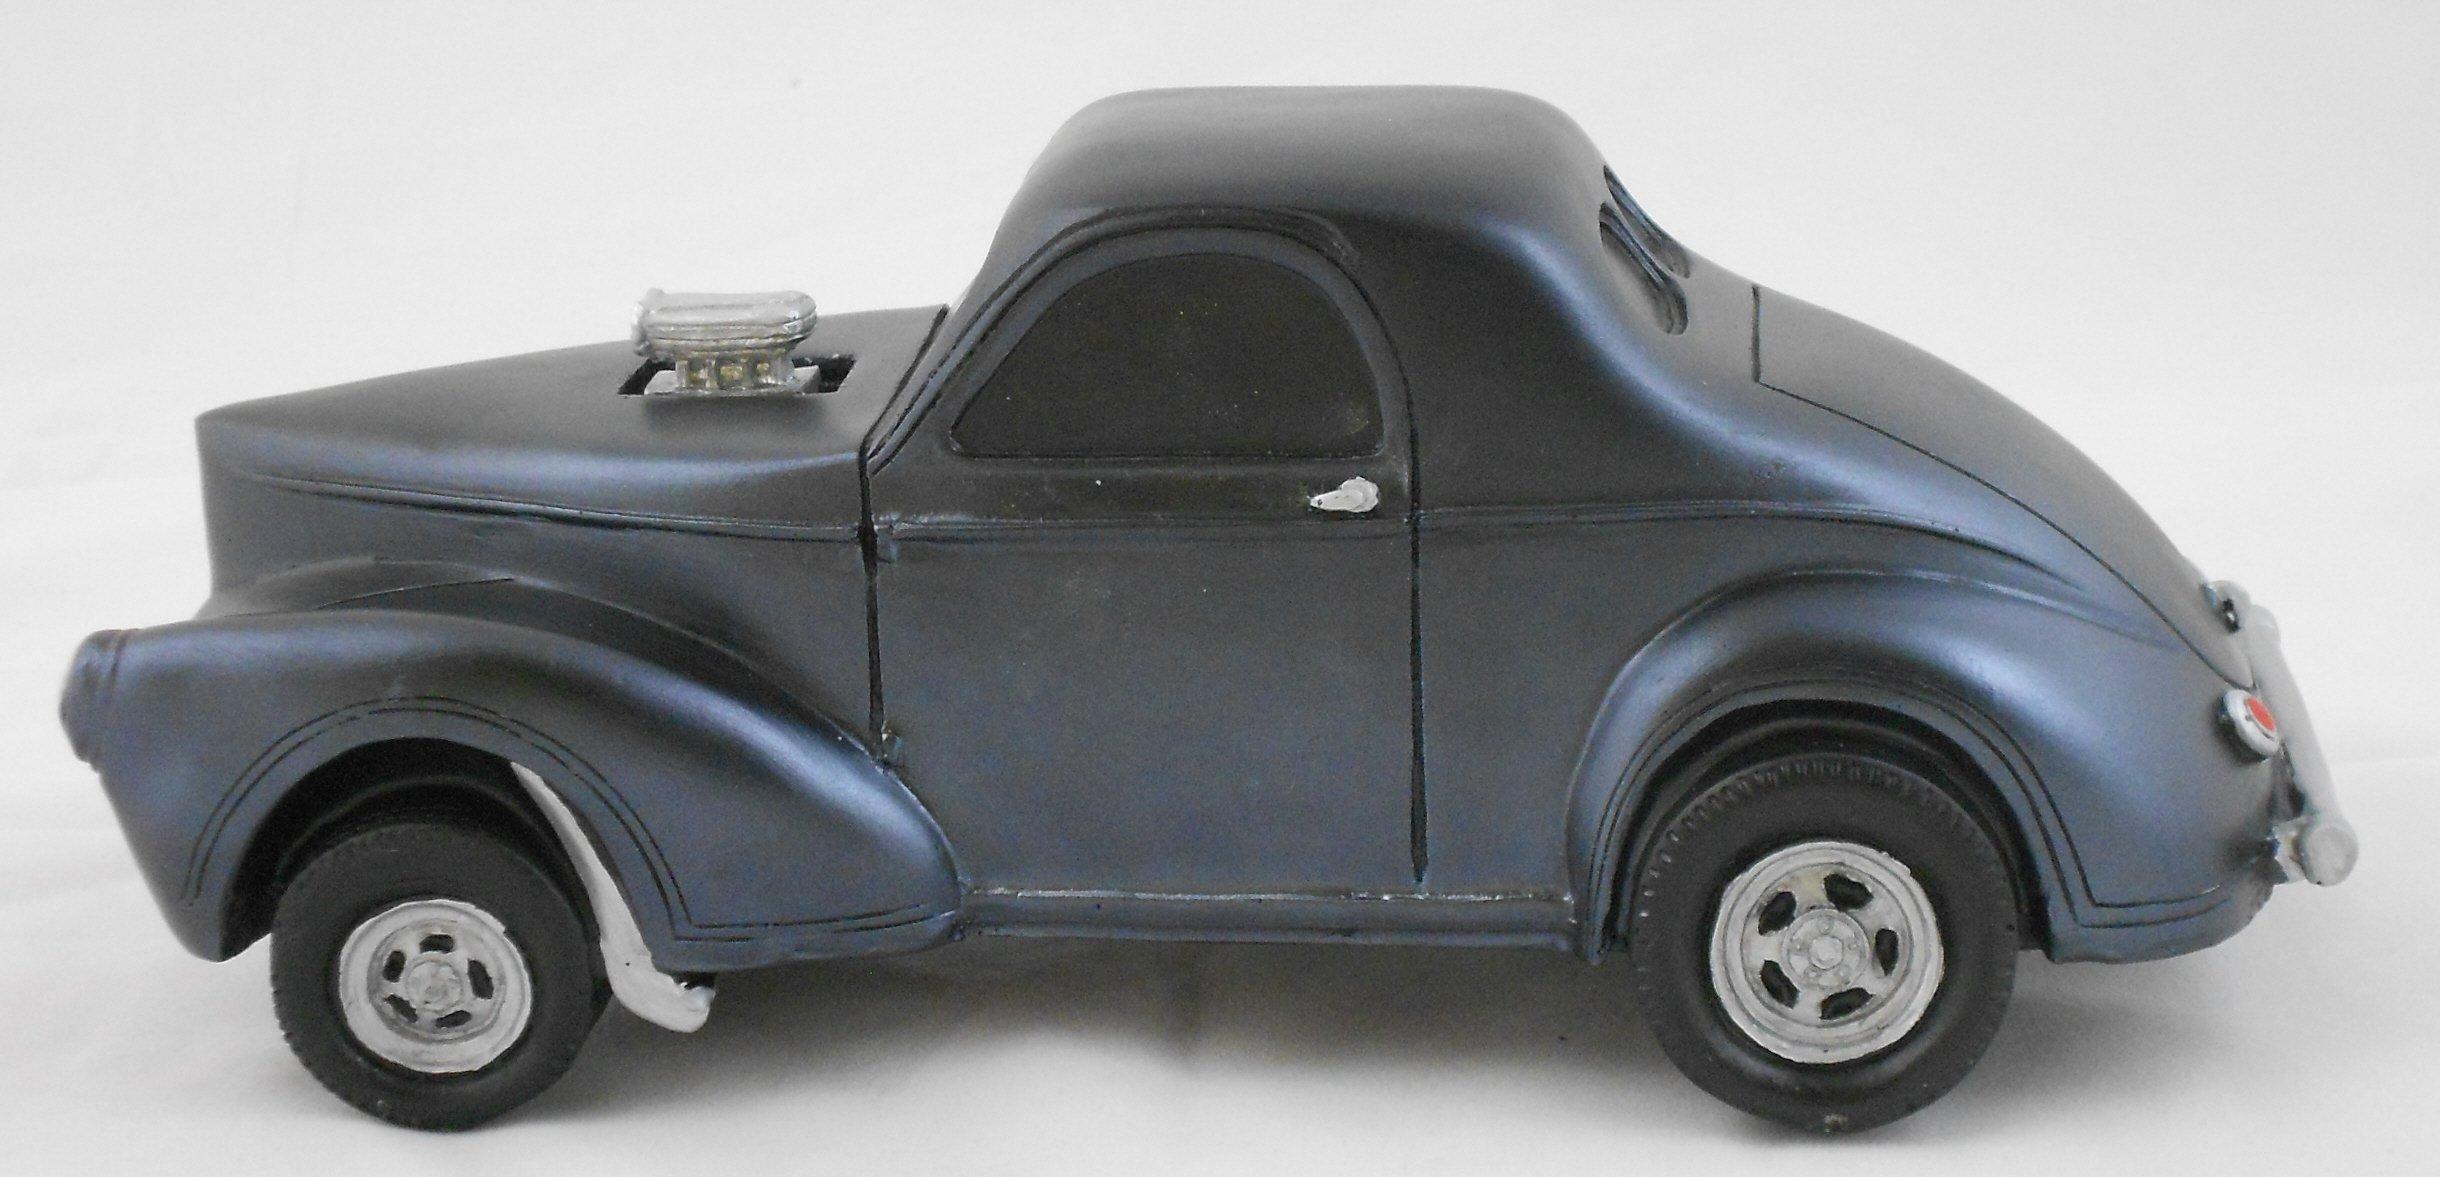 Gasser Model 1941 Willys 1:18 Scale Black by Gasser Models (Image #1)